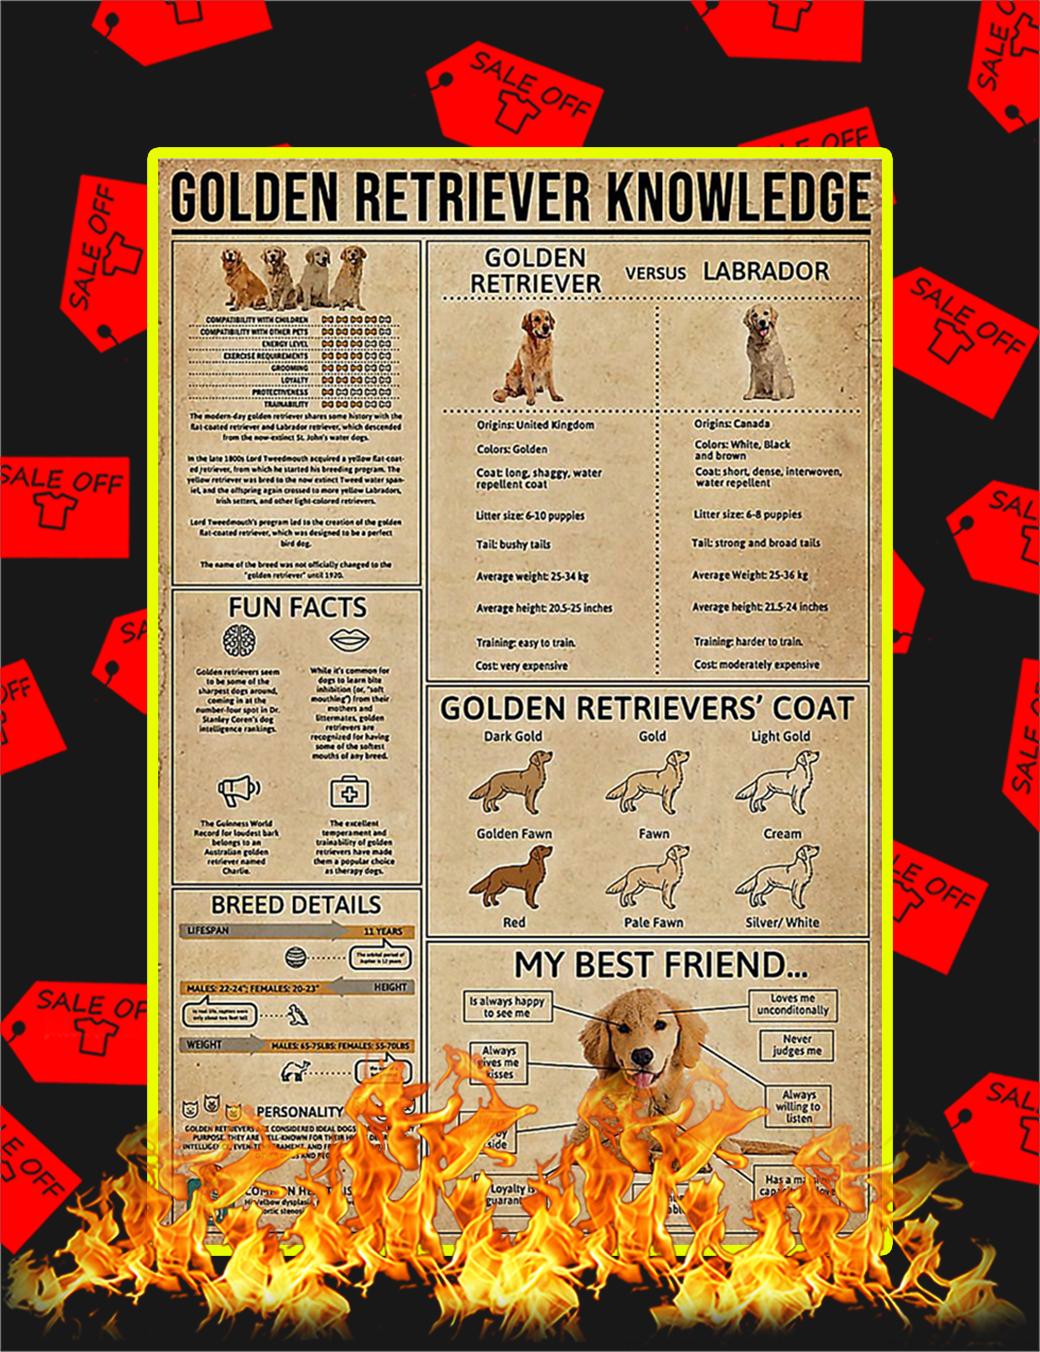 Golden Retriever Knowledge Poster - 24x36